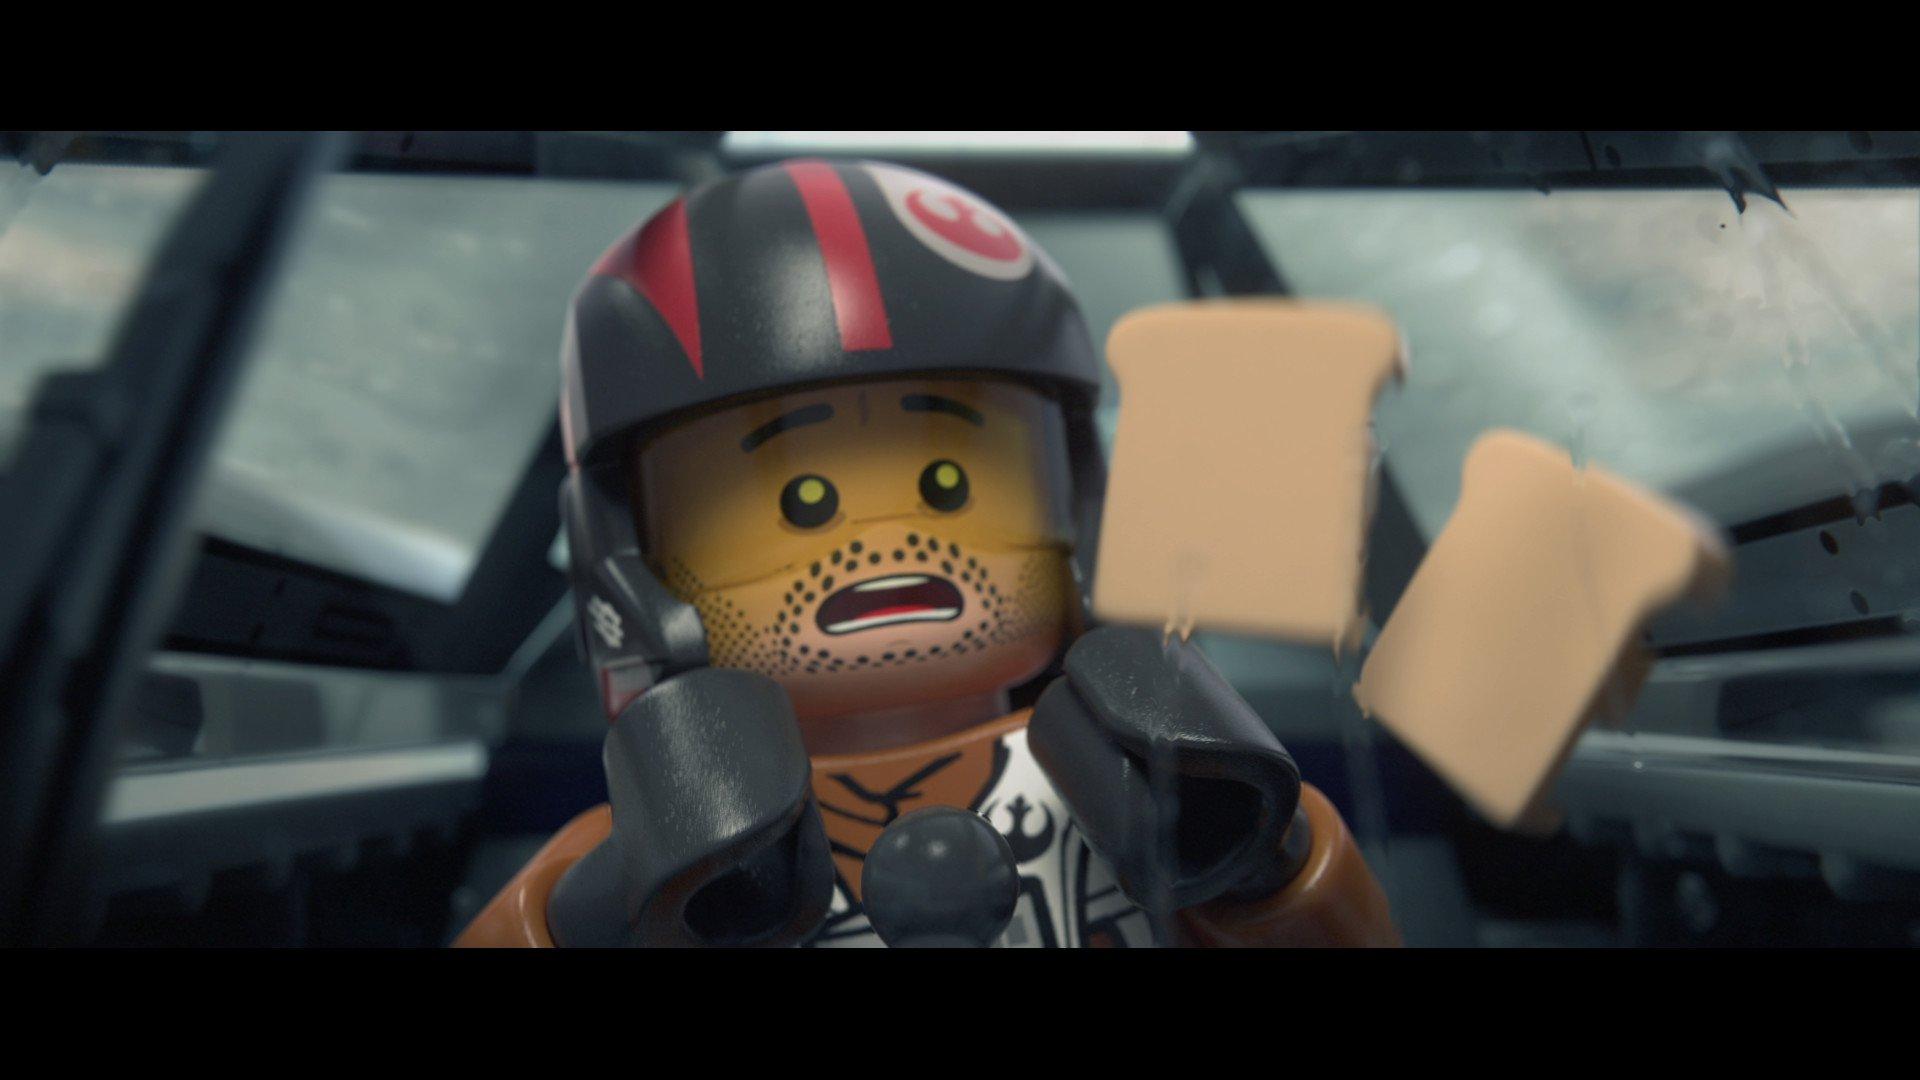 LEGO Star Wars The Force Awakens Season Pass 8